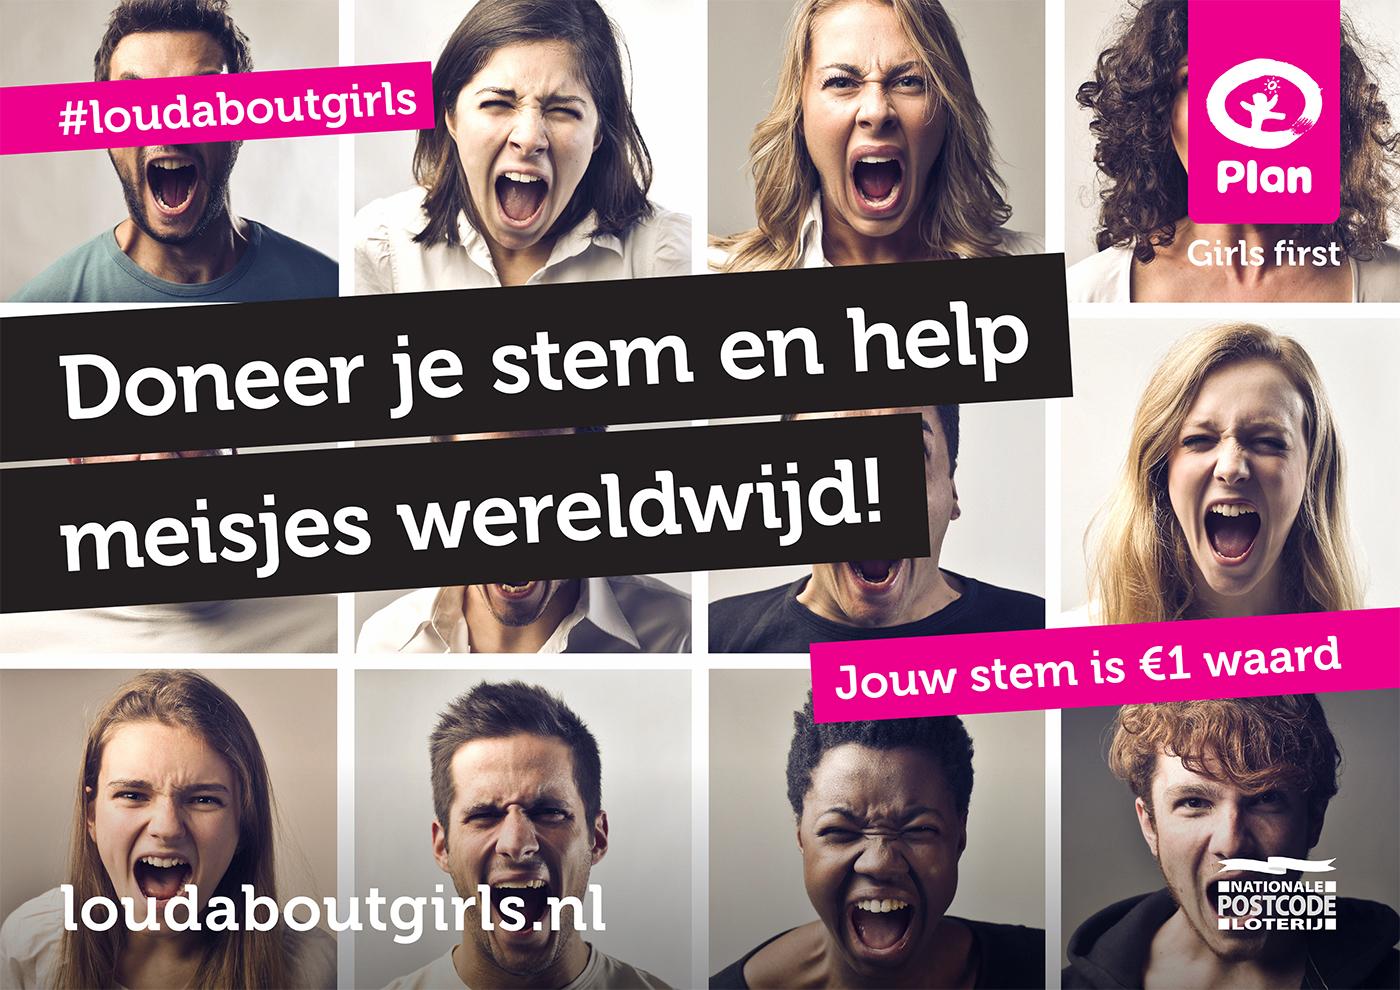 plan-nederland-loudaboutgirls